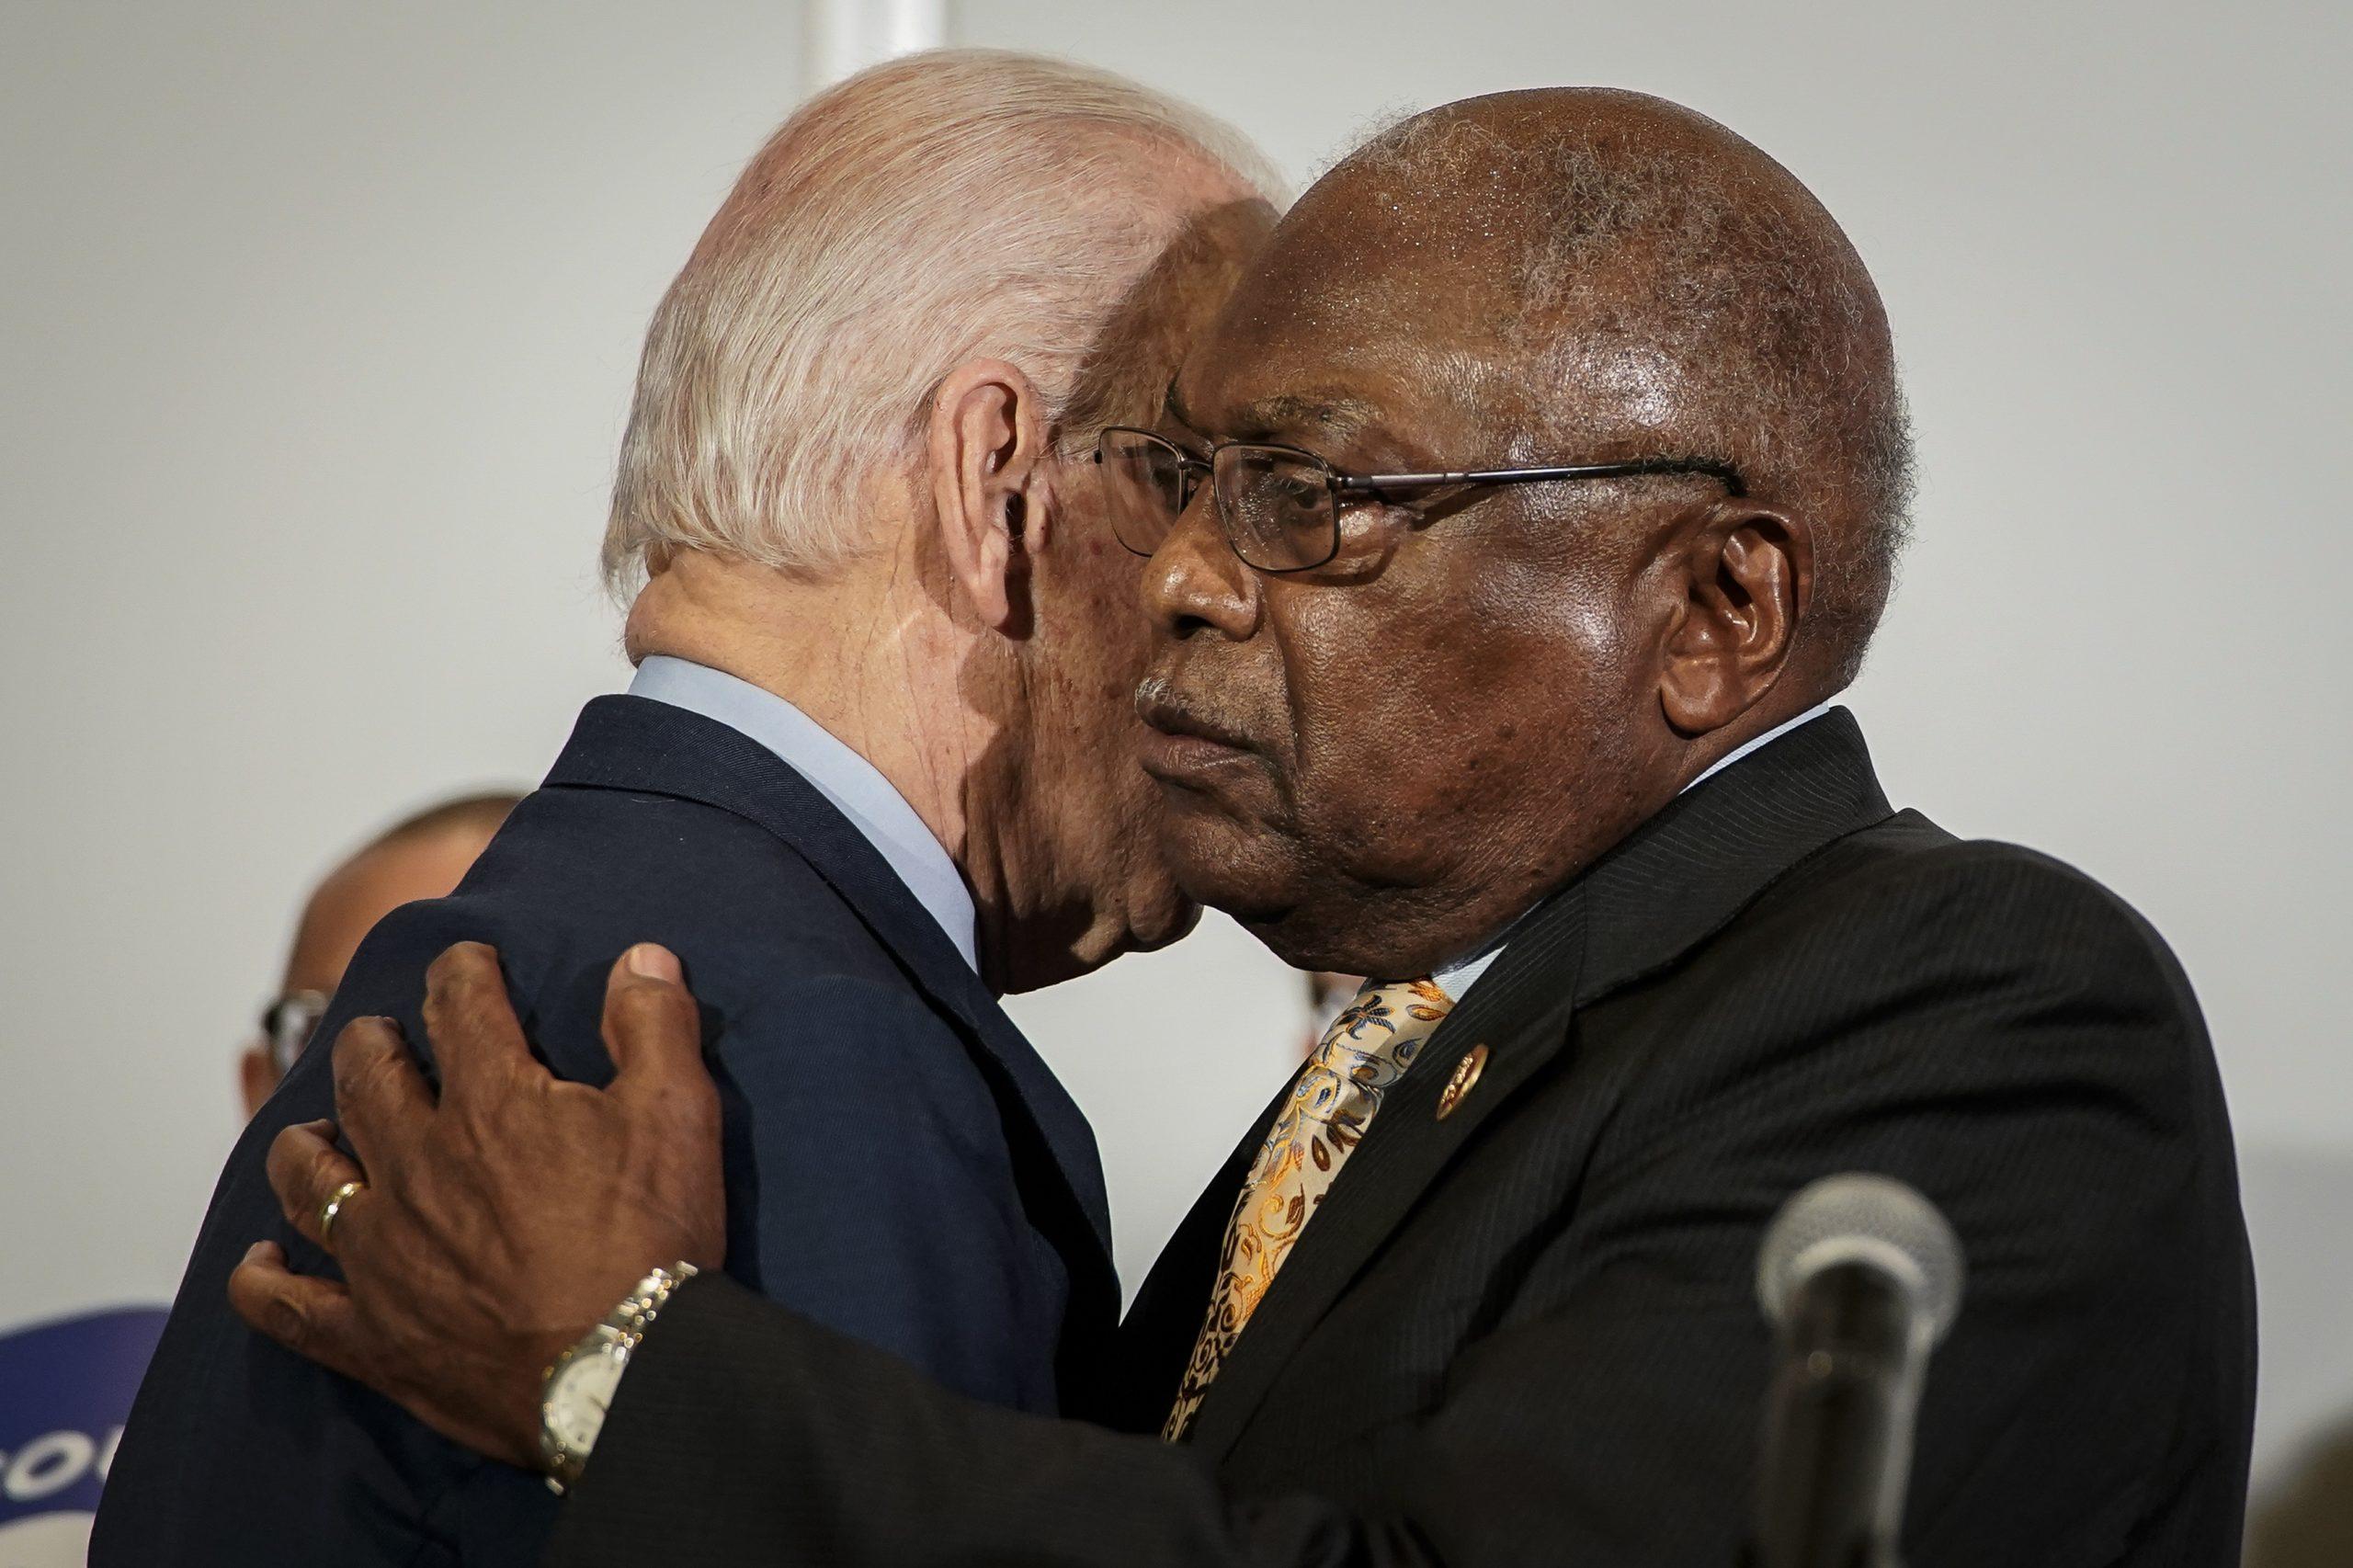 James Clyburn and Joe Biden